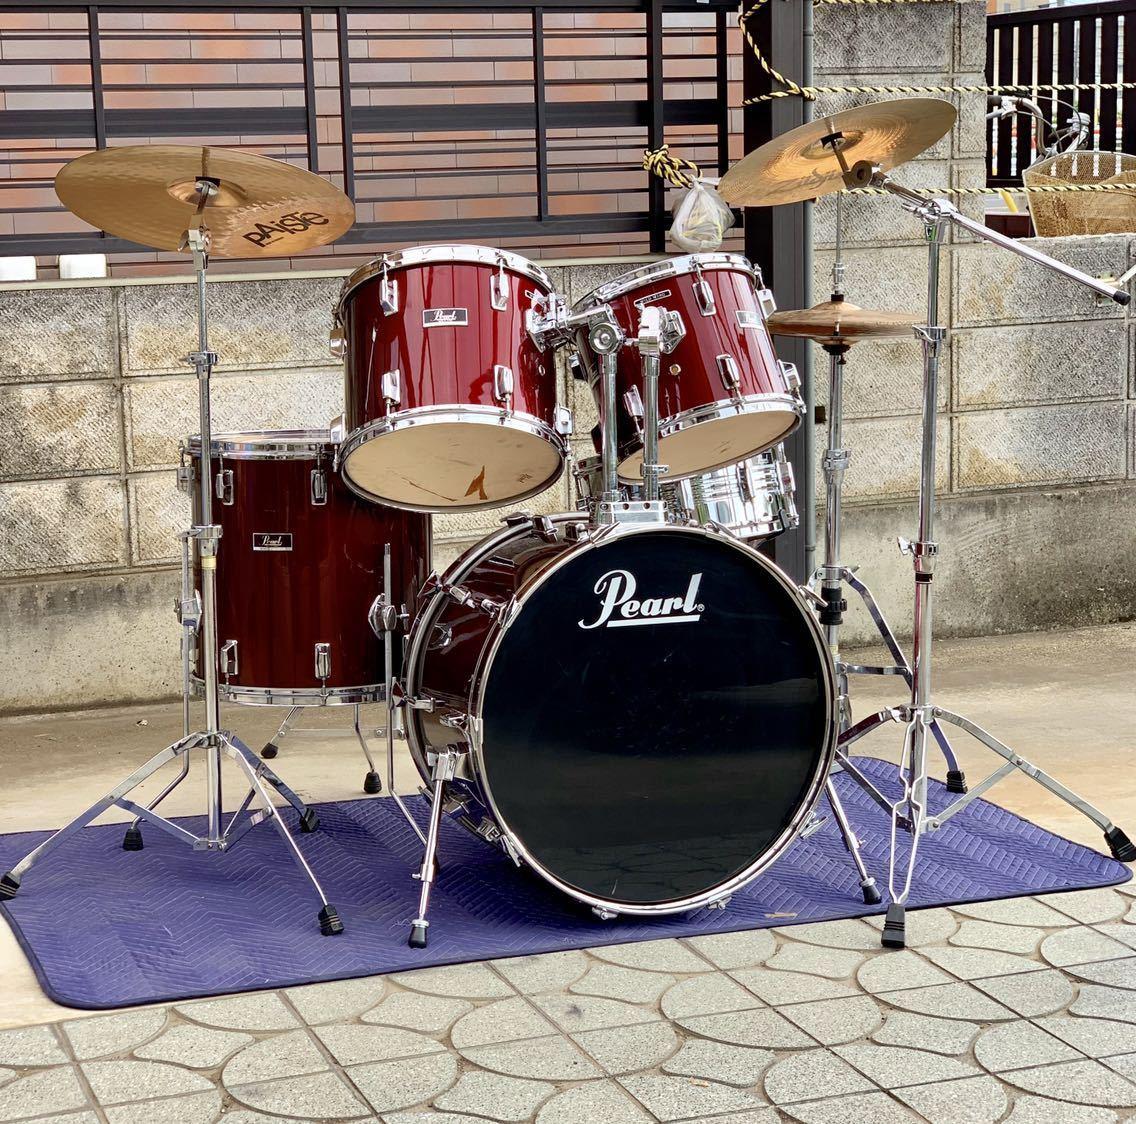 ☆Pearl/パール80'ドラムセット/WILD WINGシリーズ/日本製/程度良好!PAISTE&Zildjianシンバル